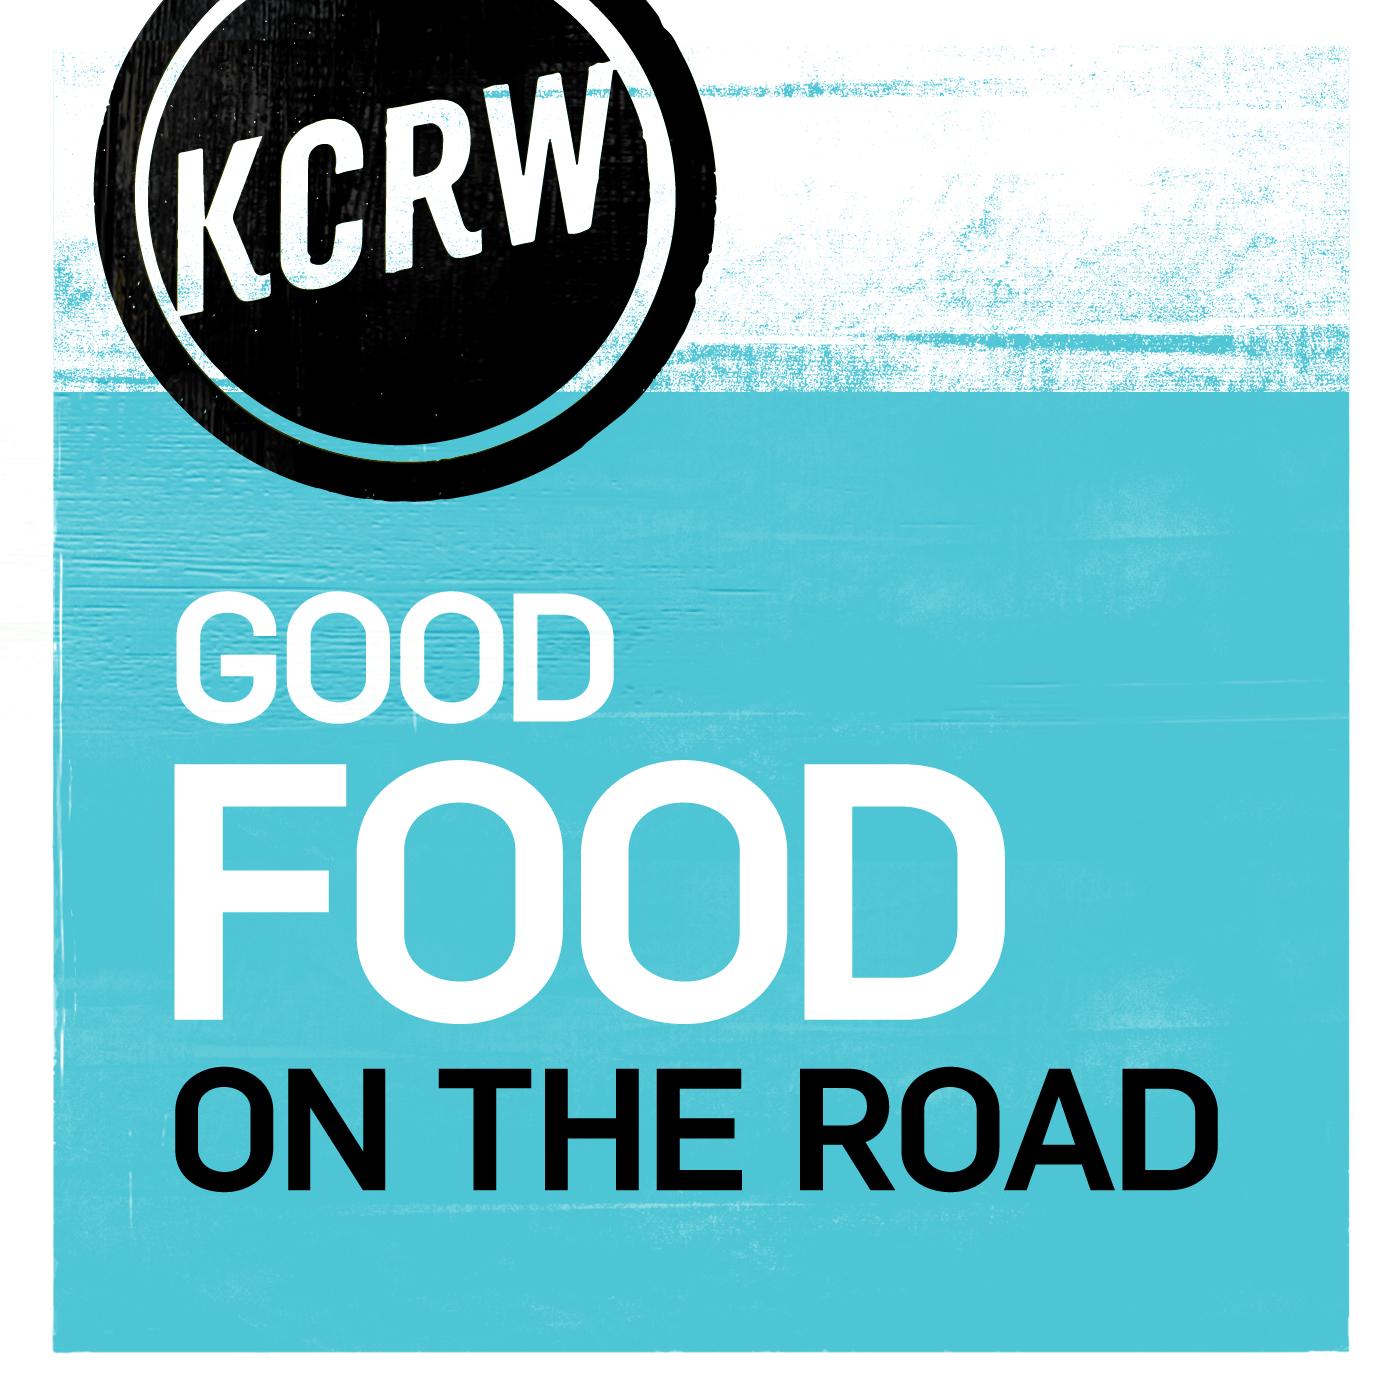 KCRW's Good Food on the Road